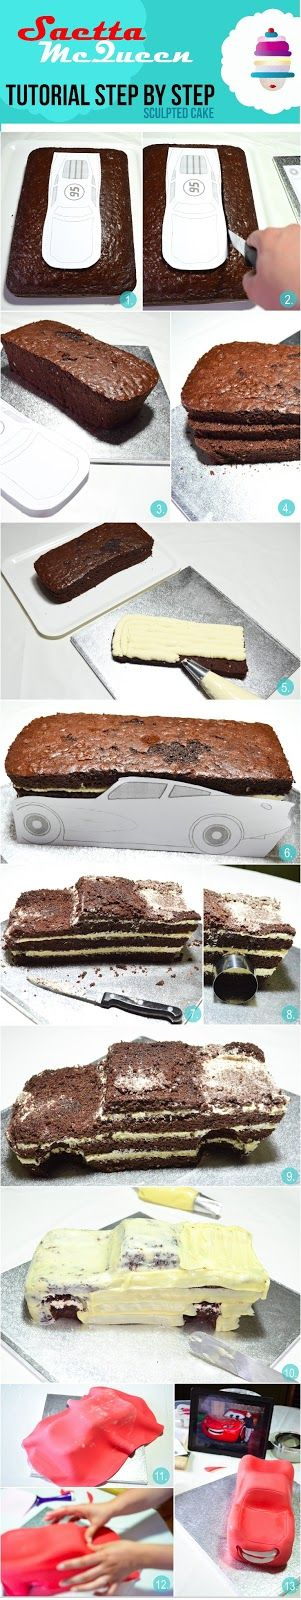 Saetta McQueen {torta scolpita}   tutorial